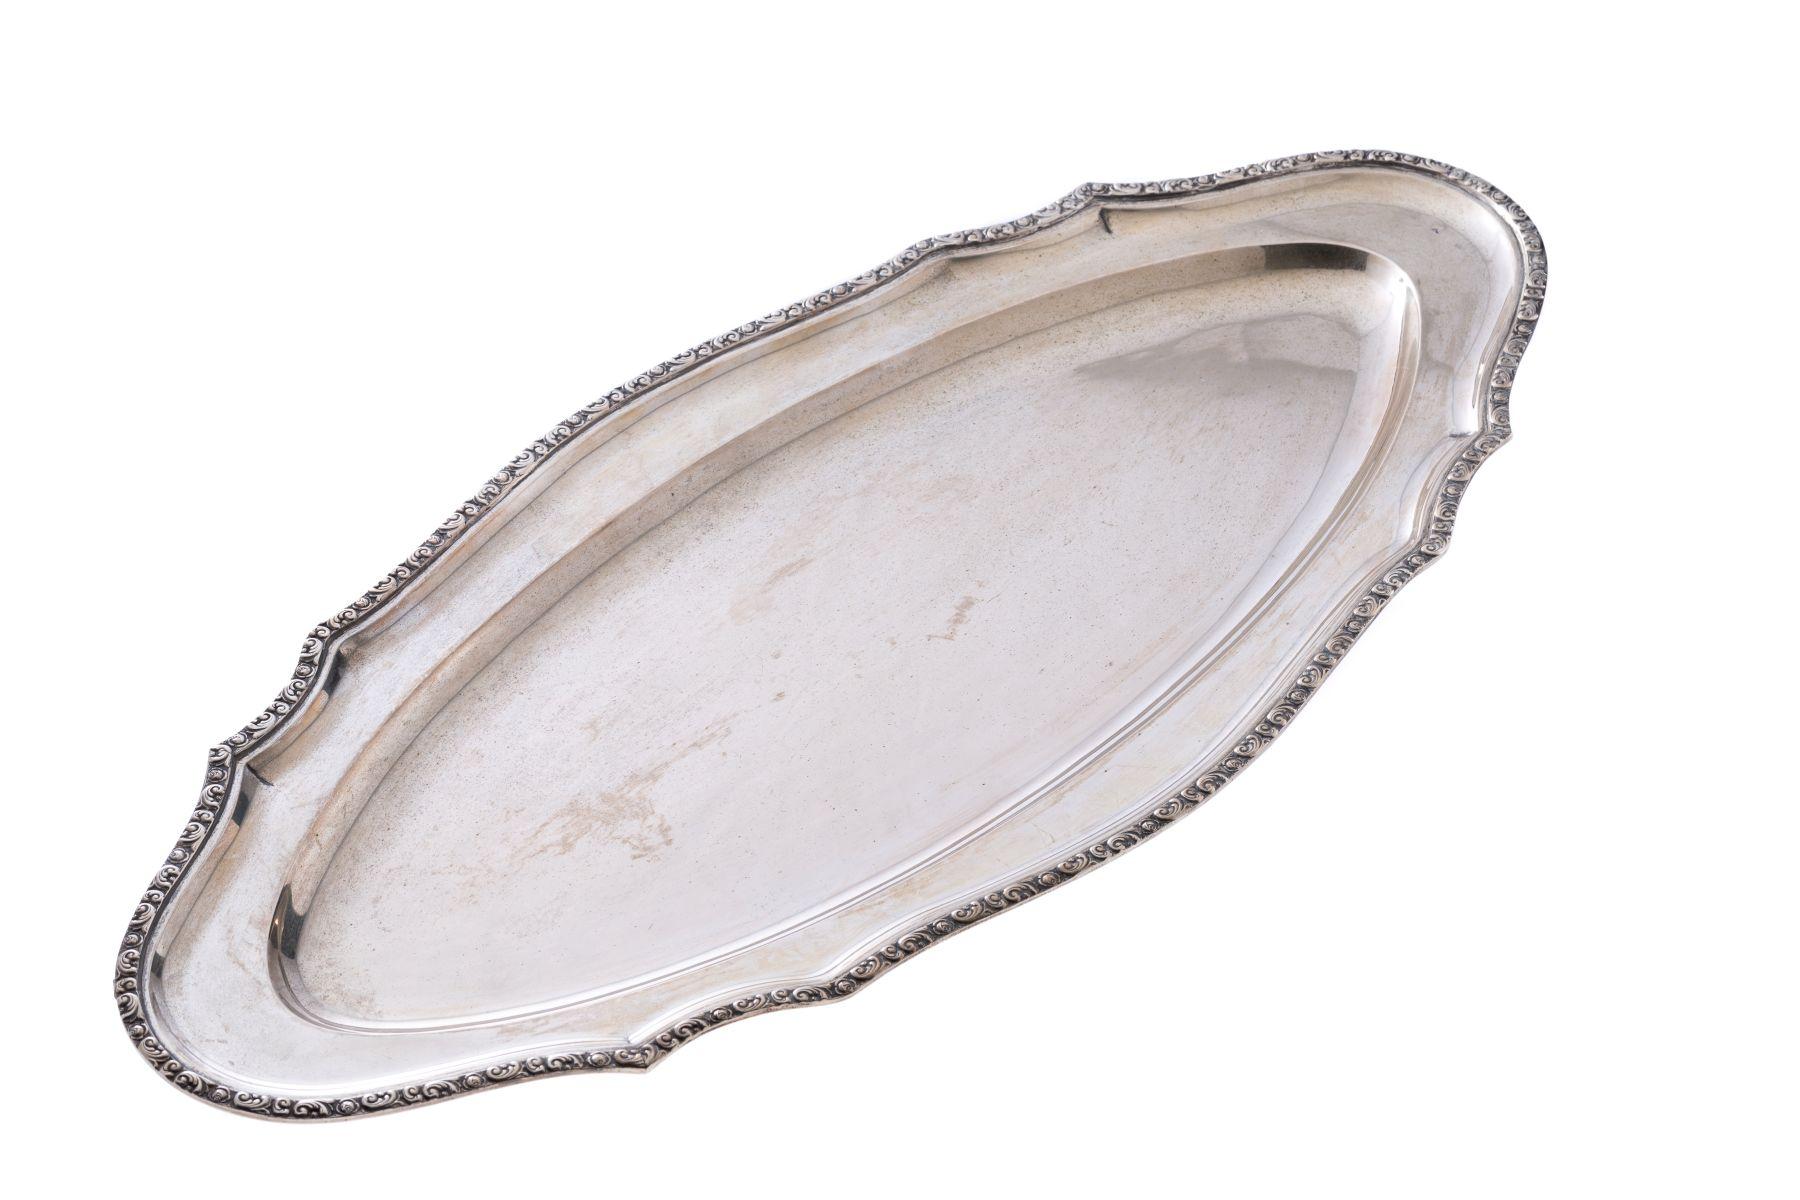 #96 Silver fish plate | Silberne Fischplatte Image